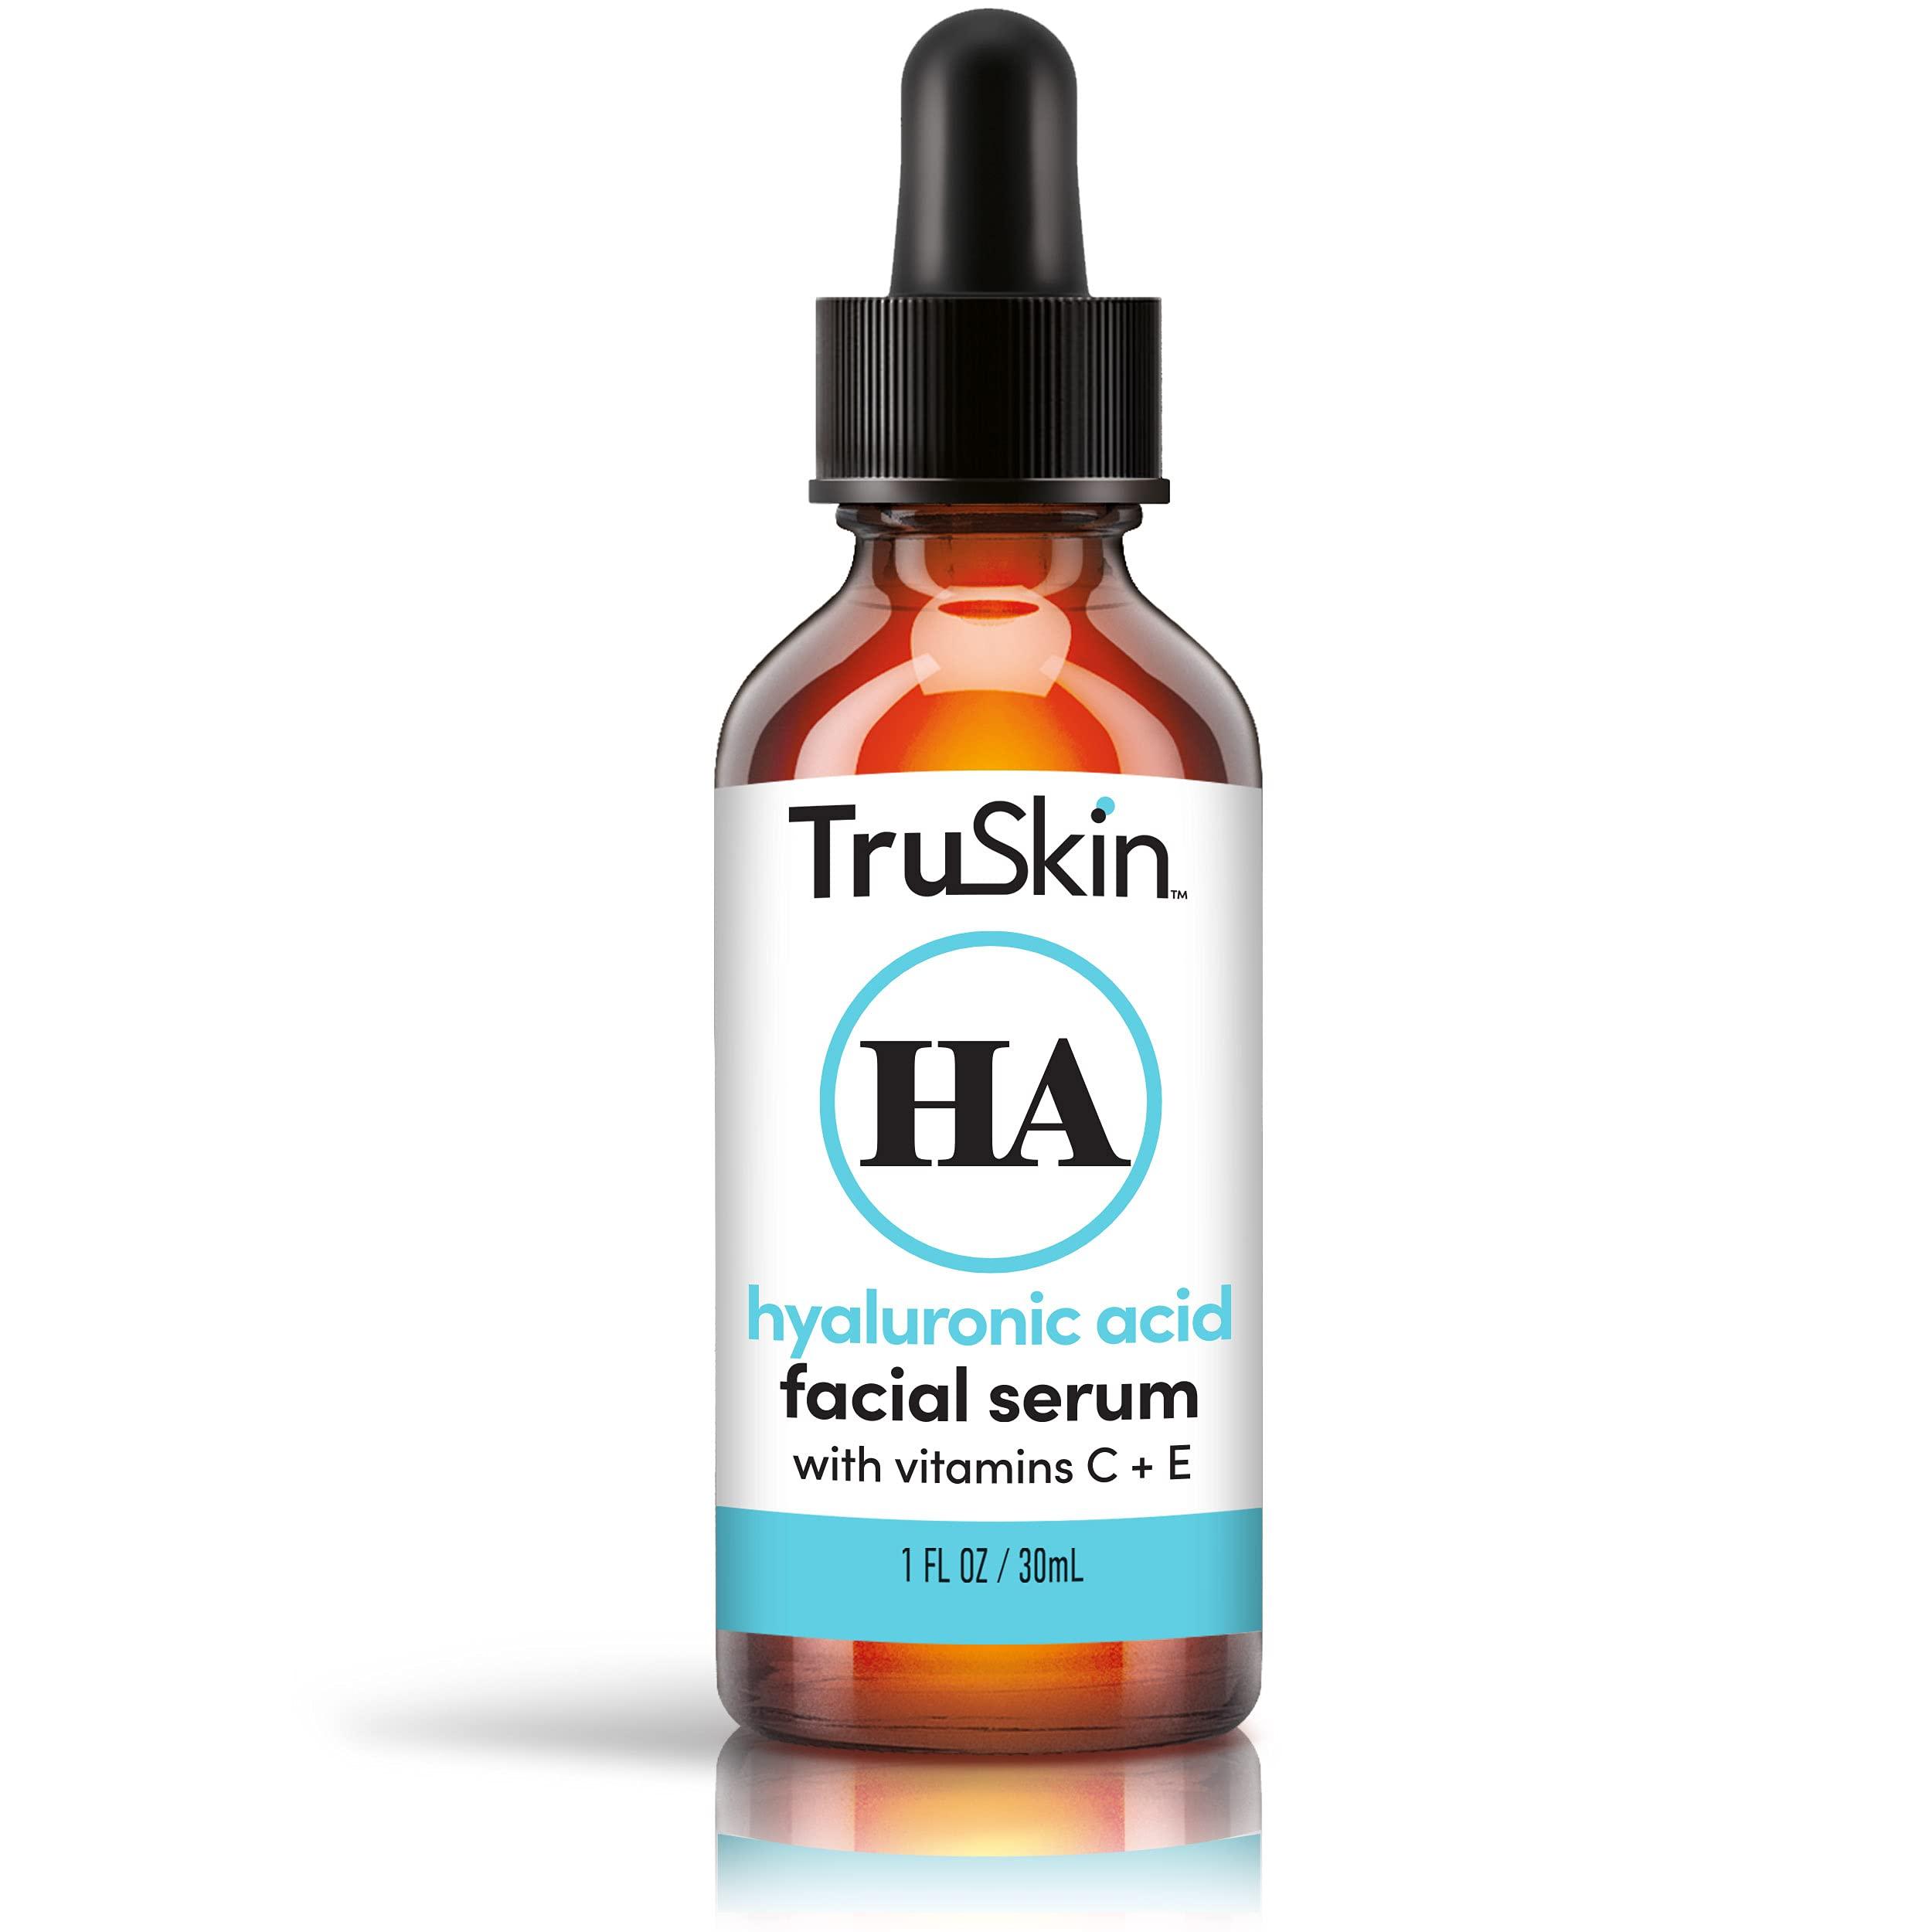 TruSkin Botanical Hyaluronic Acid Hydrating Face Serum, 1 fl oz.